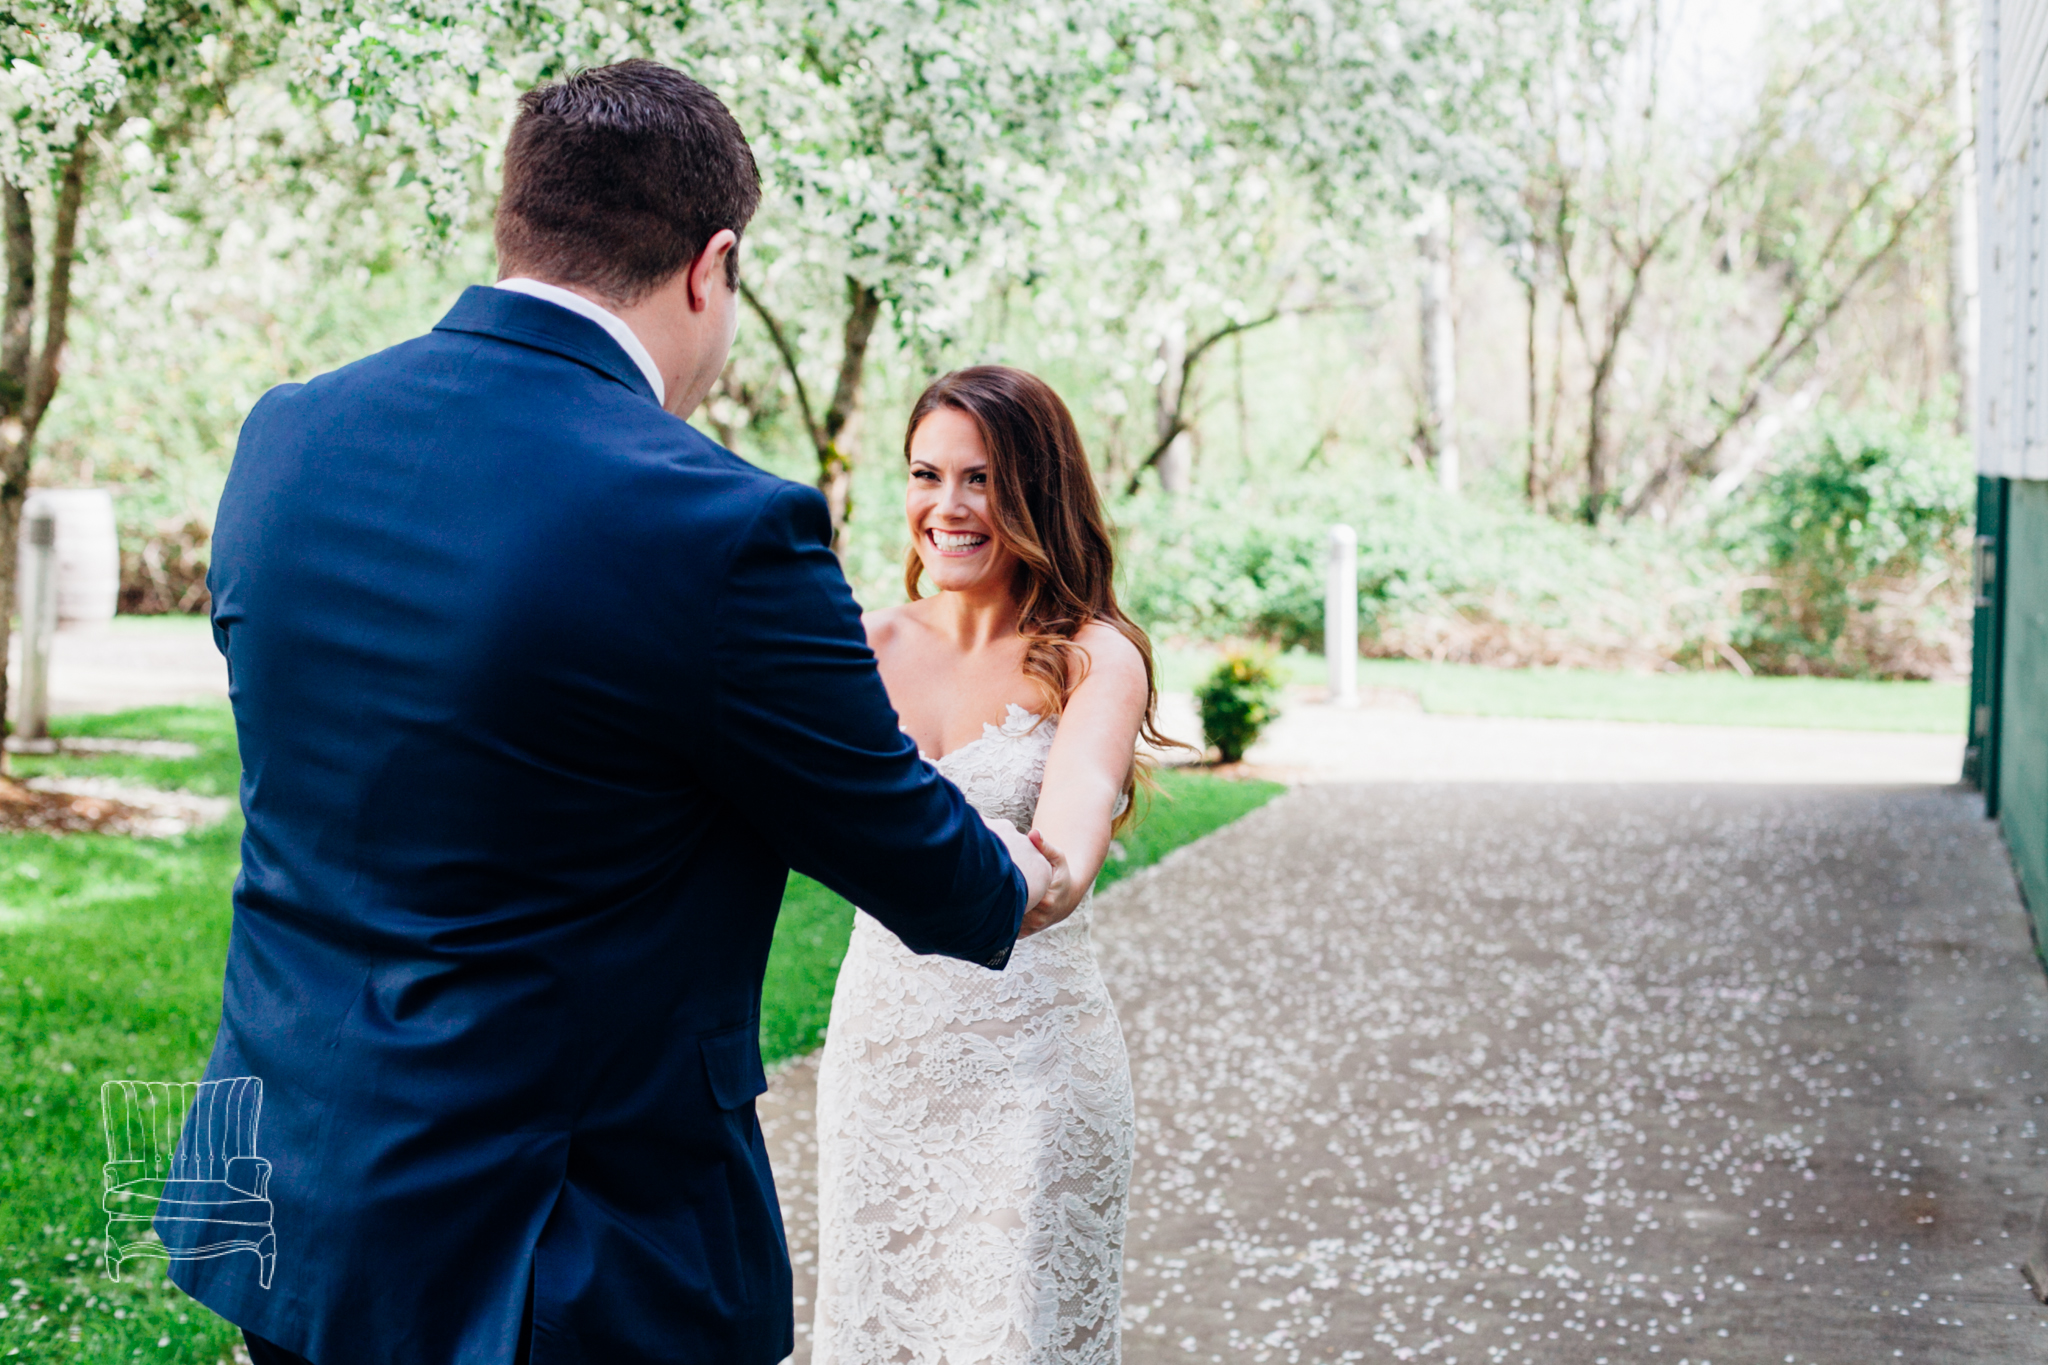 seattle-wedding-photographer-katheryn-moran-russells-bothell-wilkins-wedding-photo-13.jpg